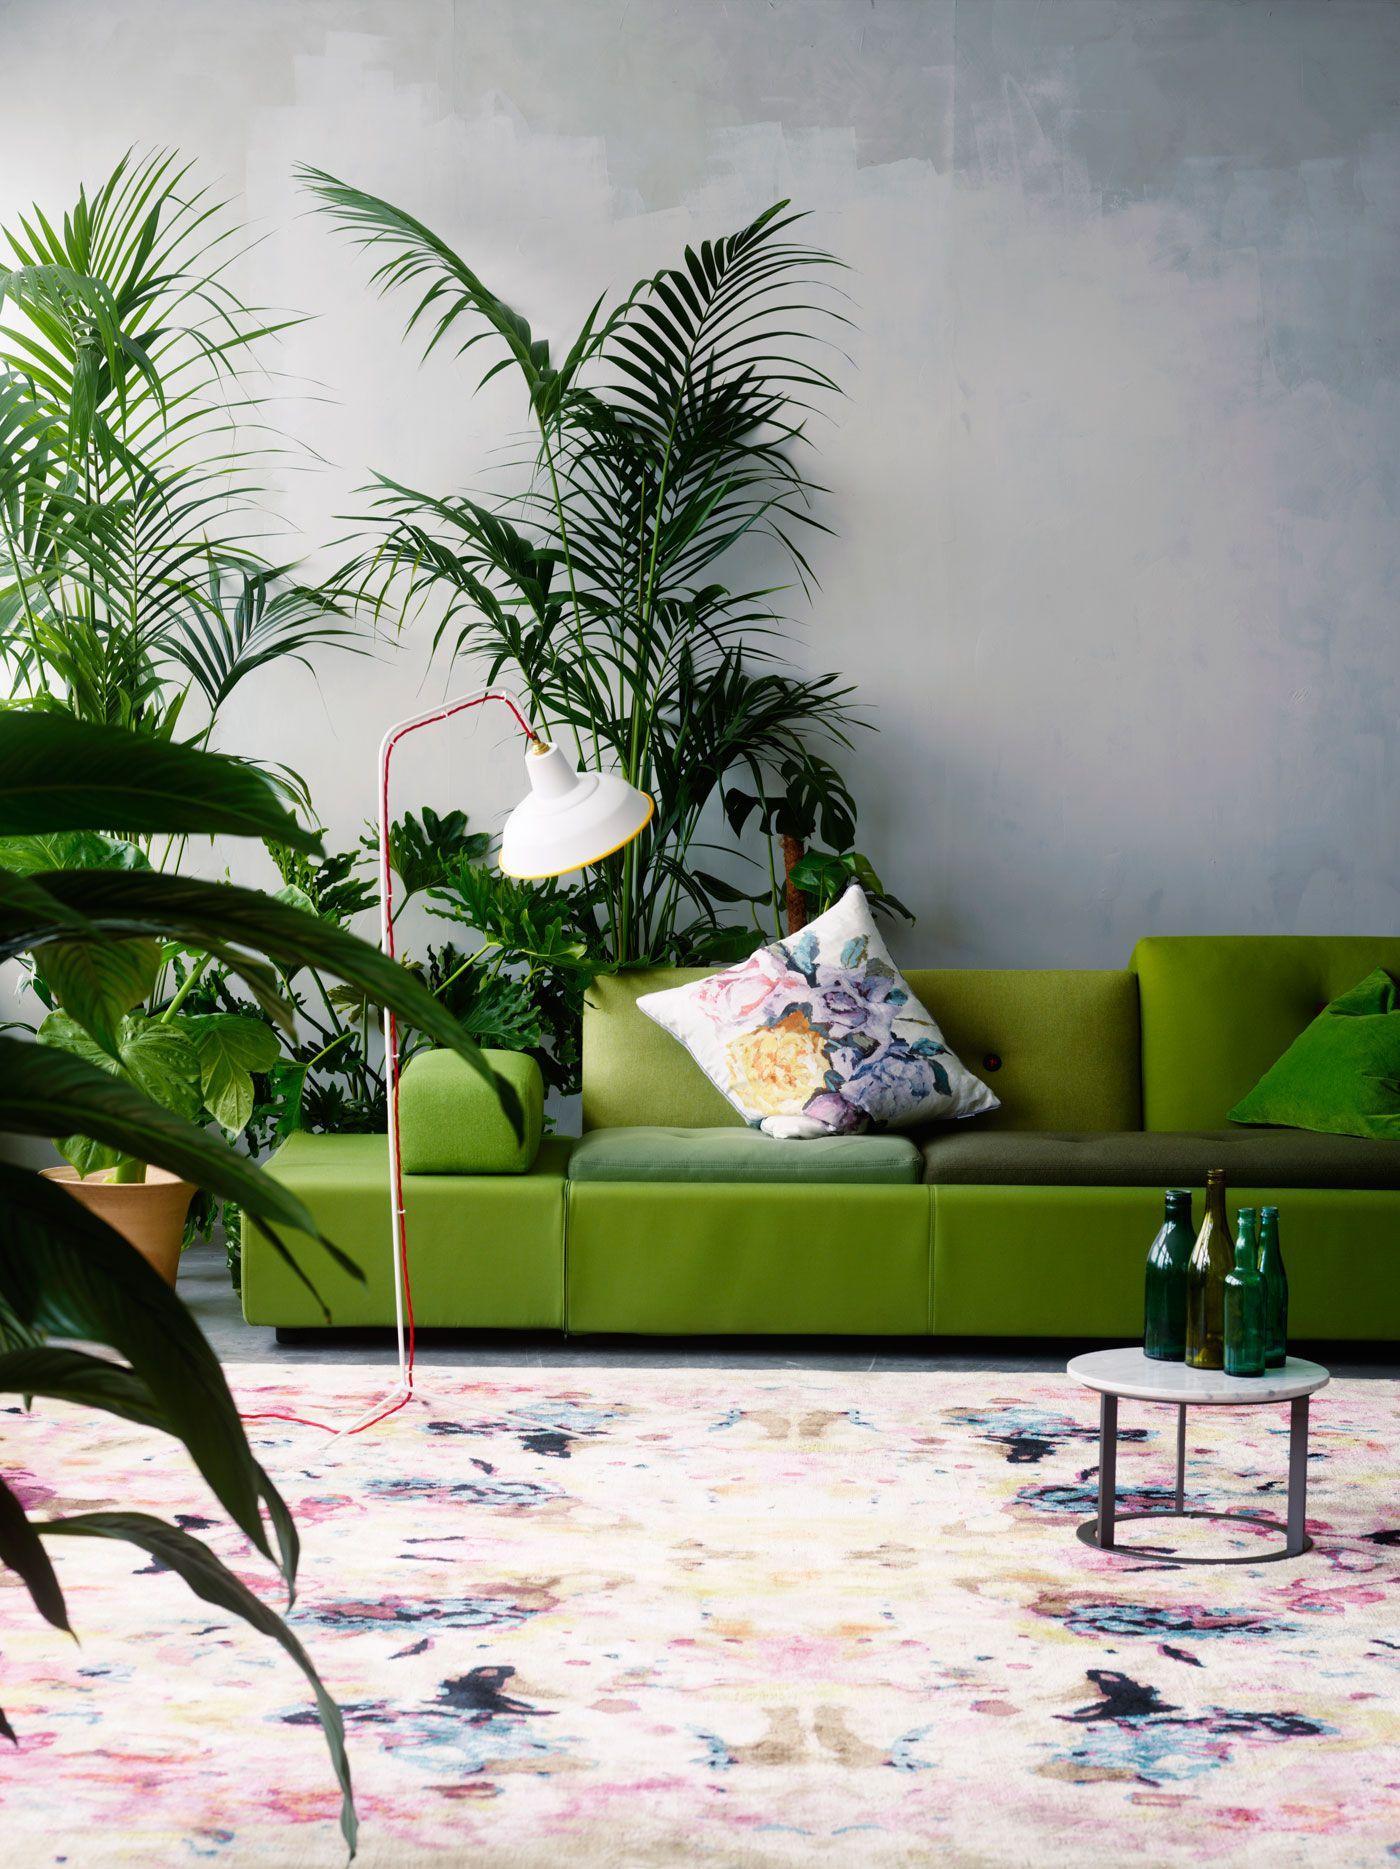 Home interior design farbkombinationen krakvik u duorazio interior arrangements  creative studio oslo and